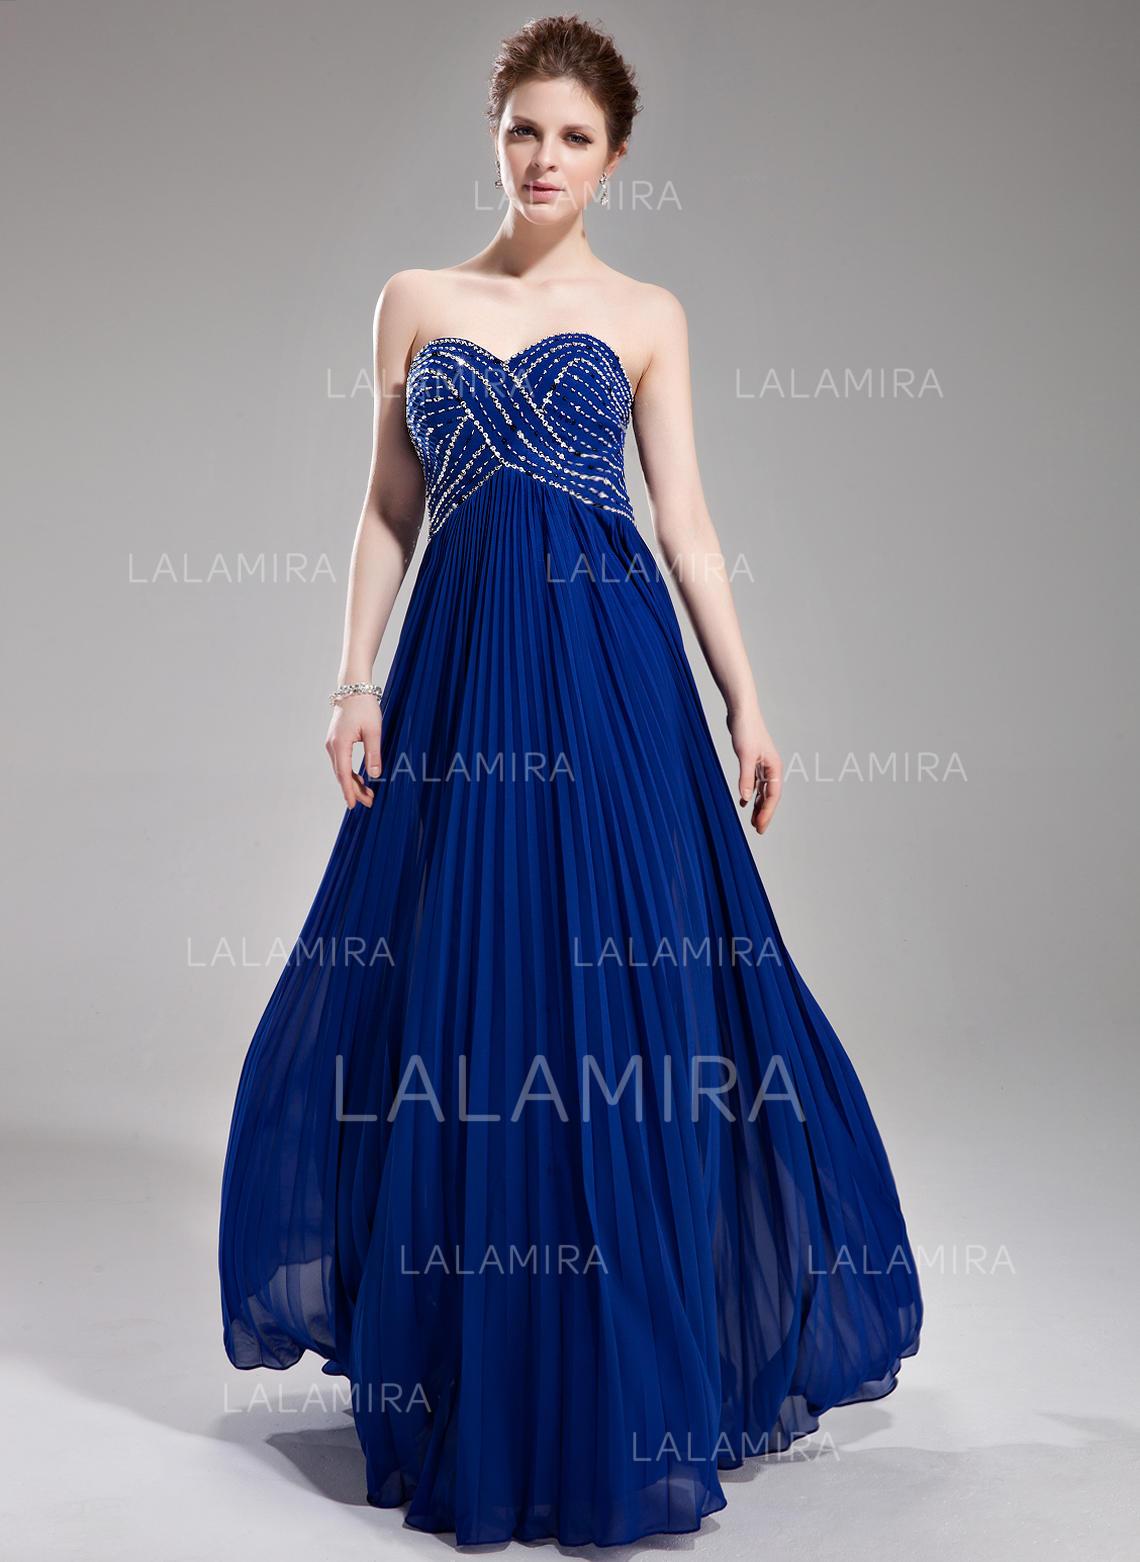 f2e7da9d347 A-Line Princess Chiffon Prom Dresses Fashion Floor-Length Sweetheart  Sleeveless (018004801. Loading zoom